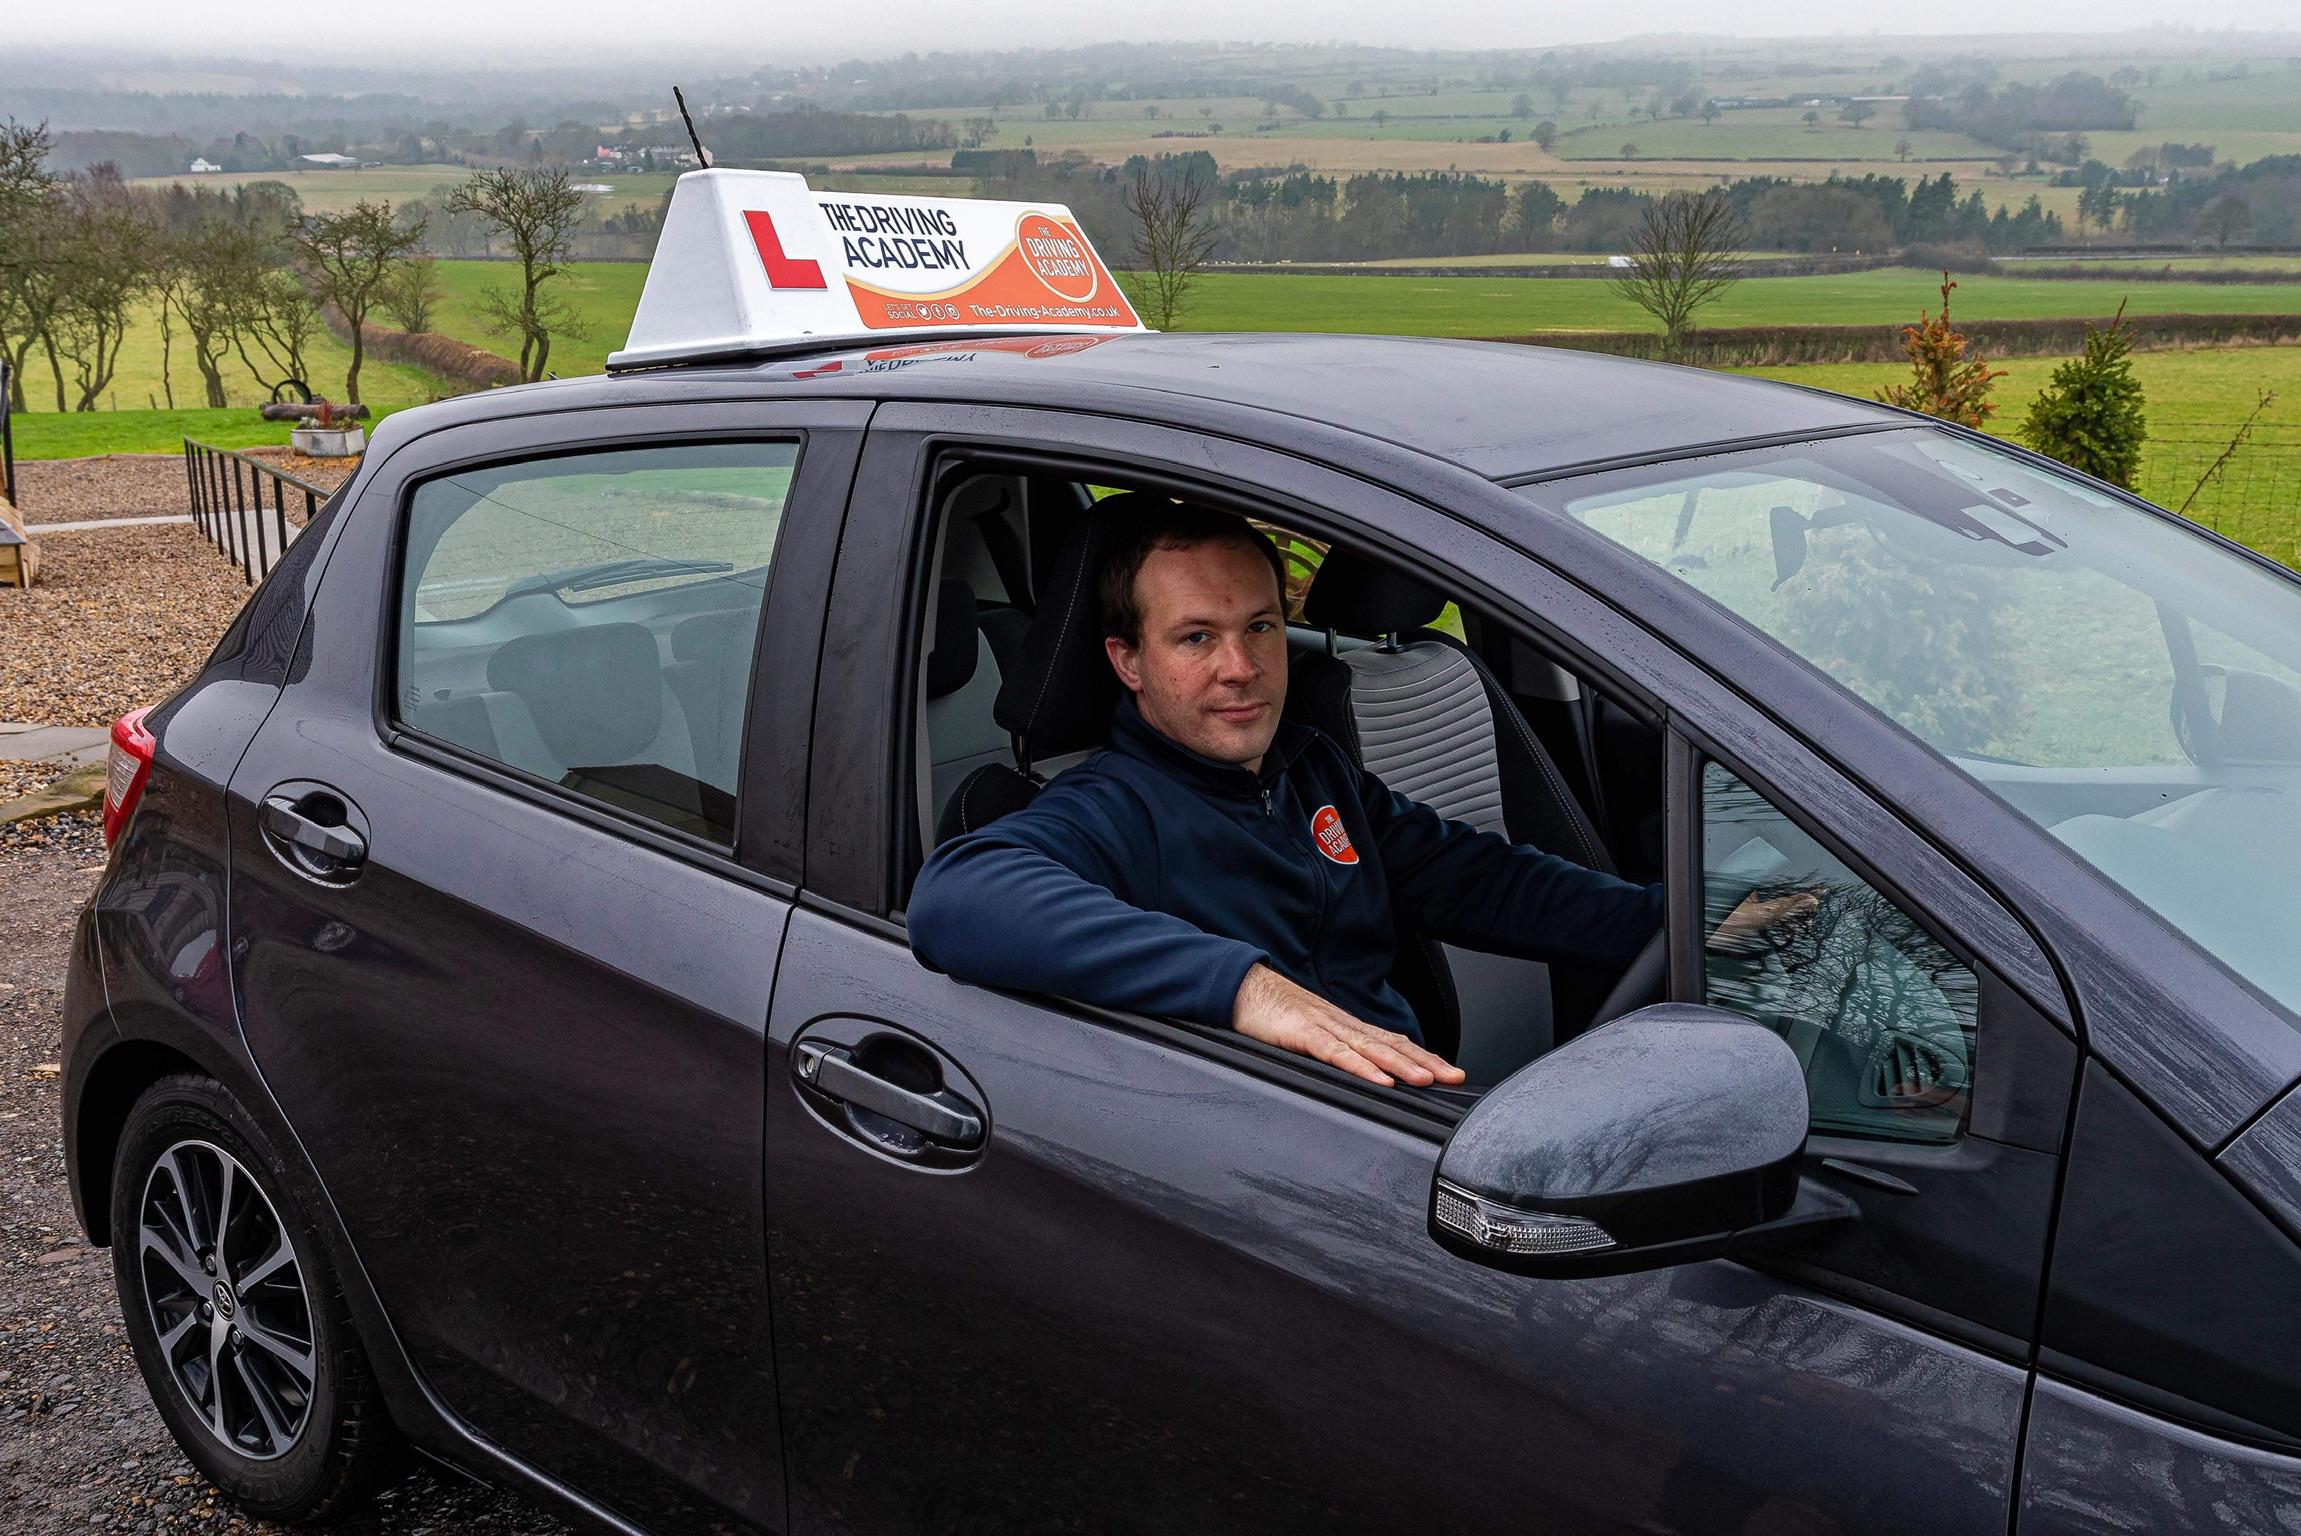 Adam Cruddace Toyota Yaris The-Driving-Academy